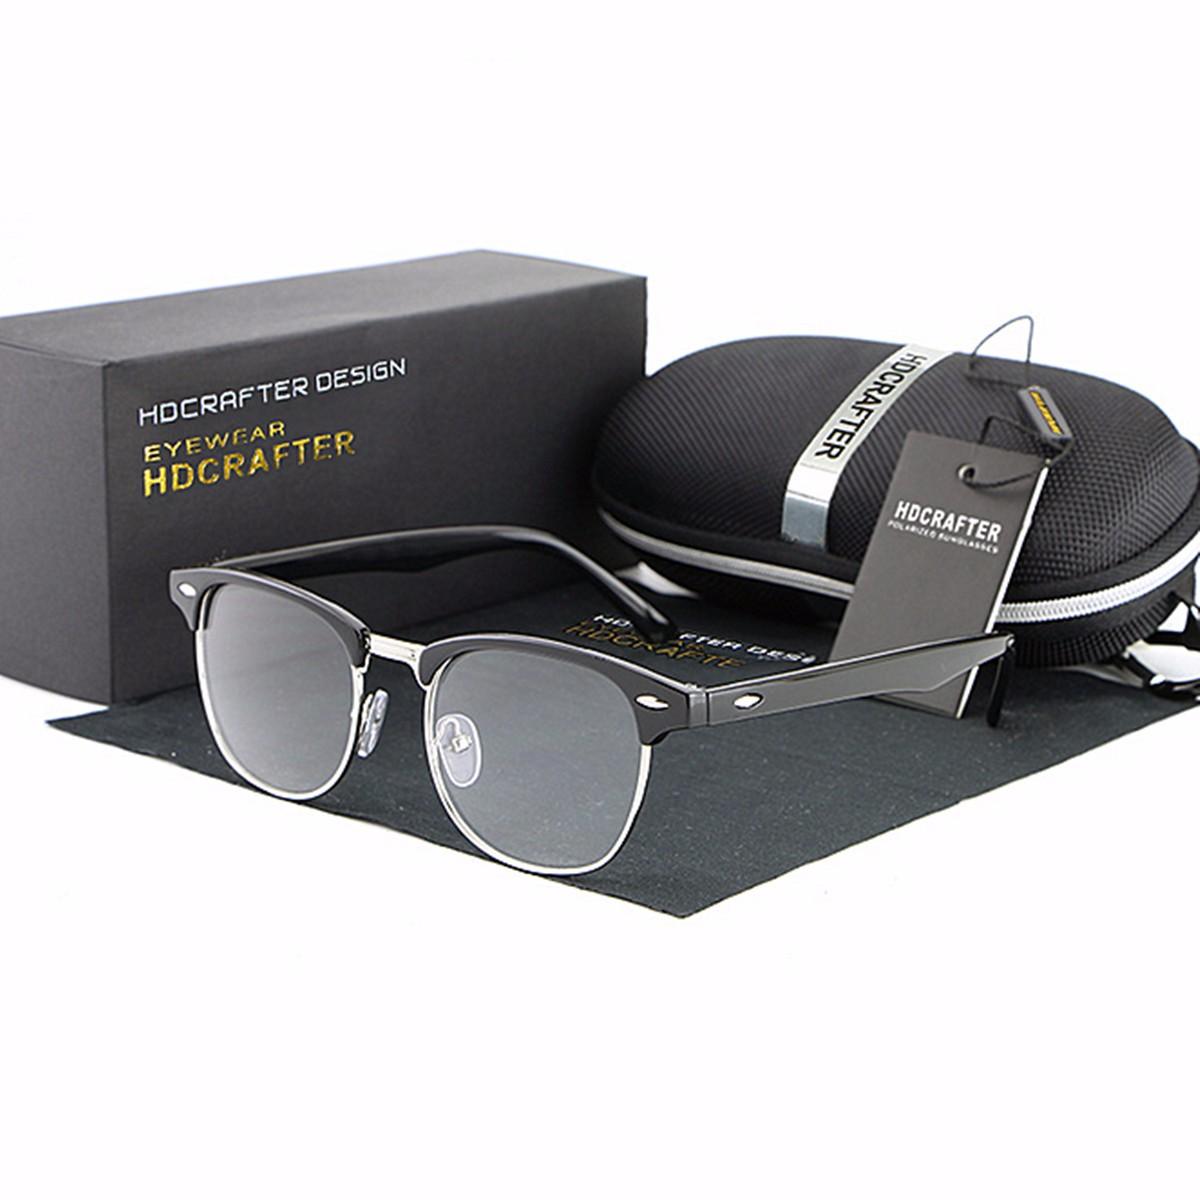 hdcrafter monture lunettes optique lecture vue verre loupe. Black Bedroom Furniture Sets. Home Design Ideas